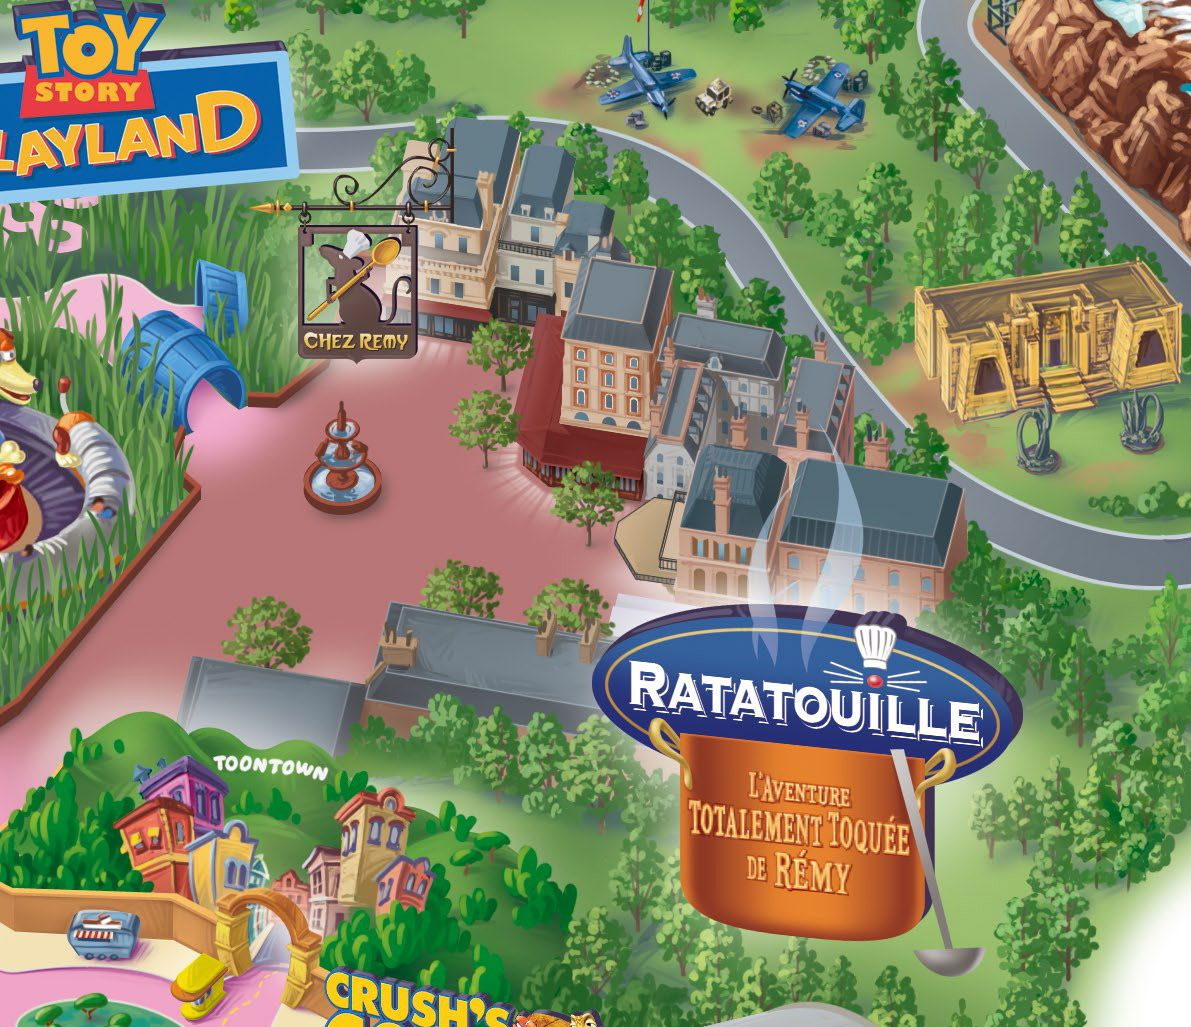 Dedicated to DLP – Celebrating Disneyland Paris Disneyland Paris News Resort Map Now Include Ratatouille